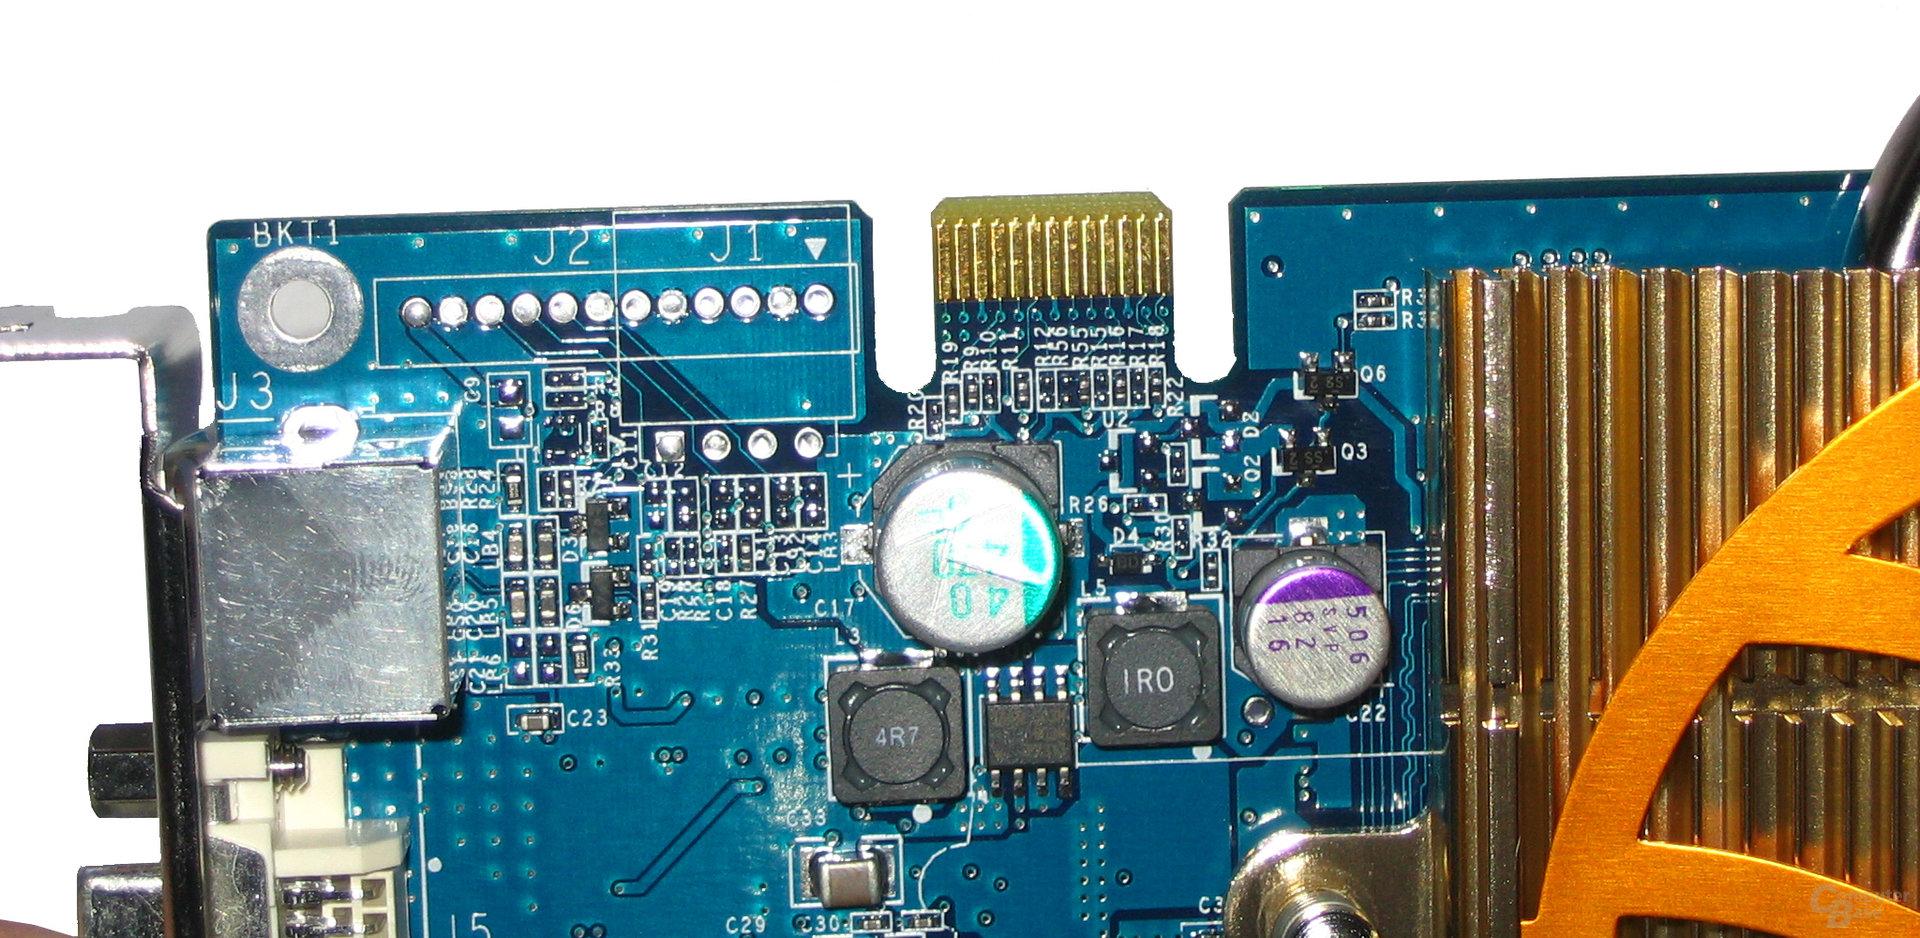 Gigabyte GeForce 6600 GT SLI-Anschluss